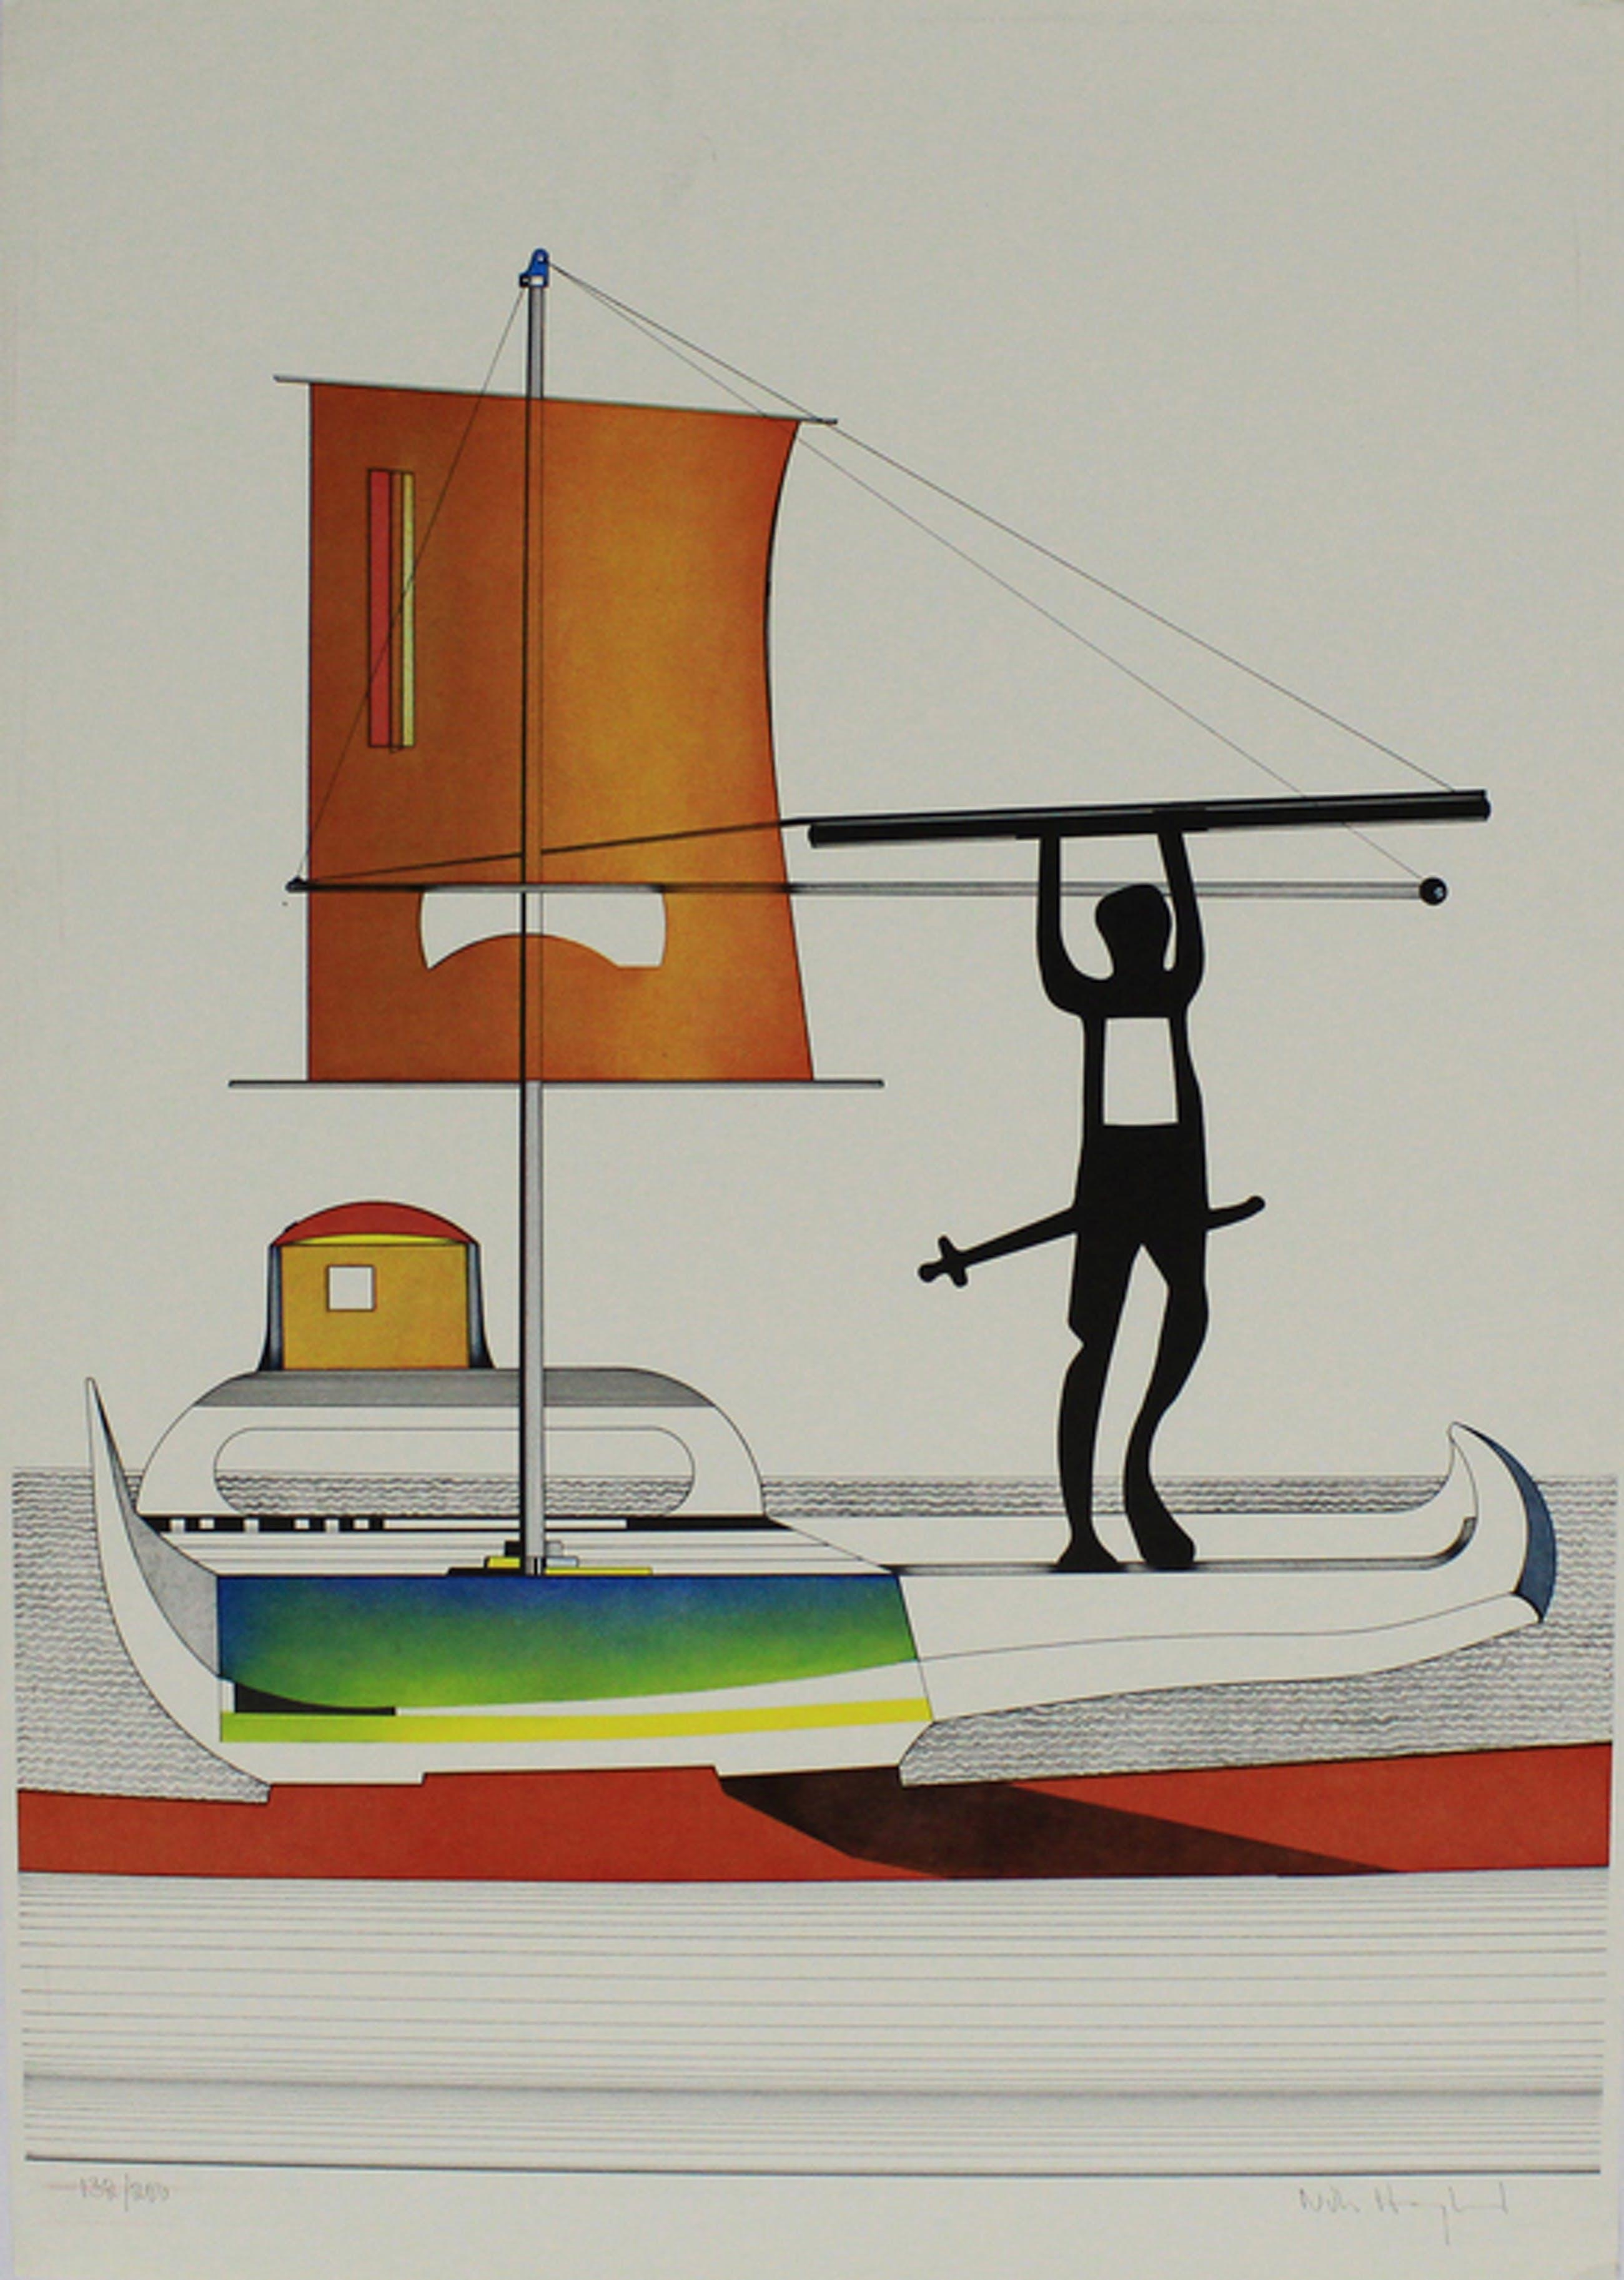 Nils Haglund - De Viking - Handgesigneerde kleuren lithografie kopen? Bied vanaf 20!